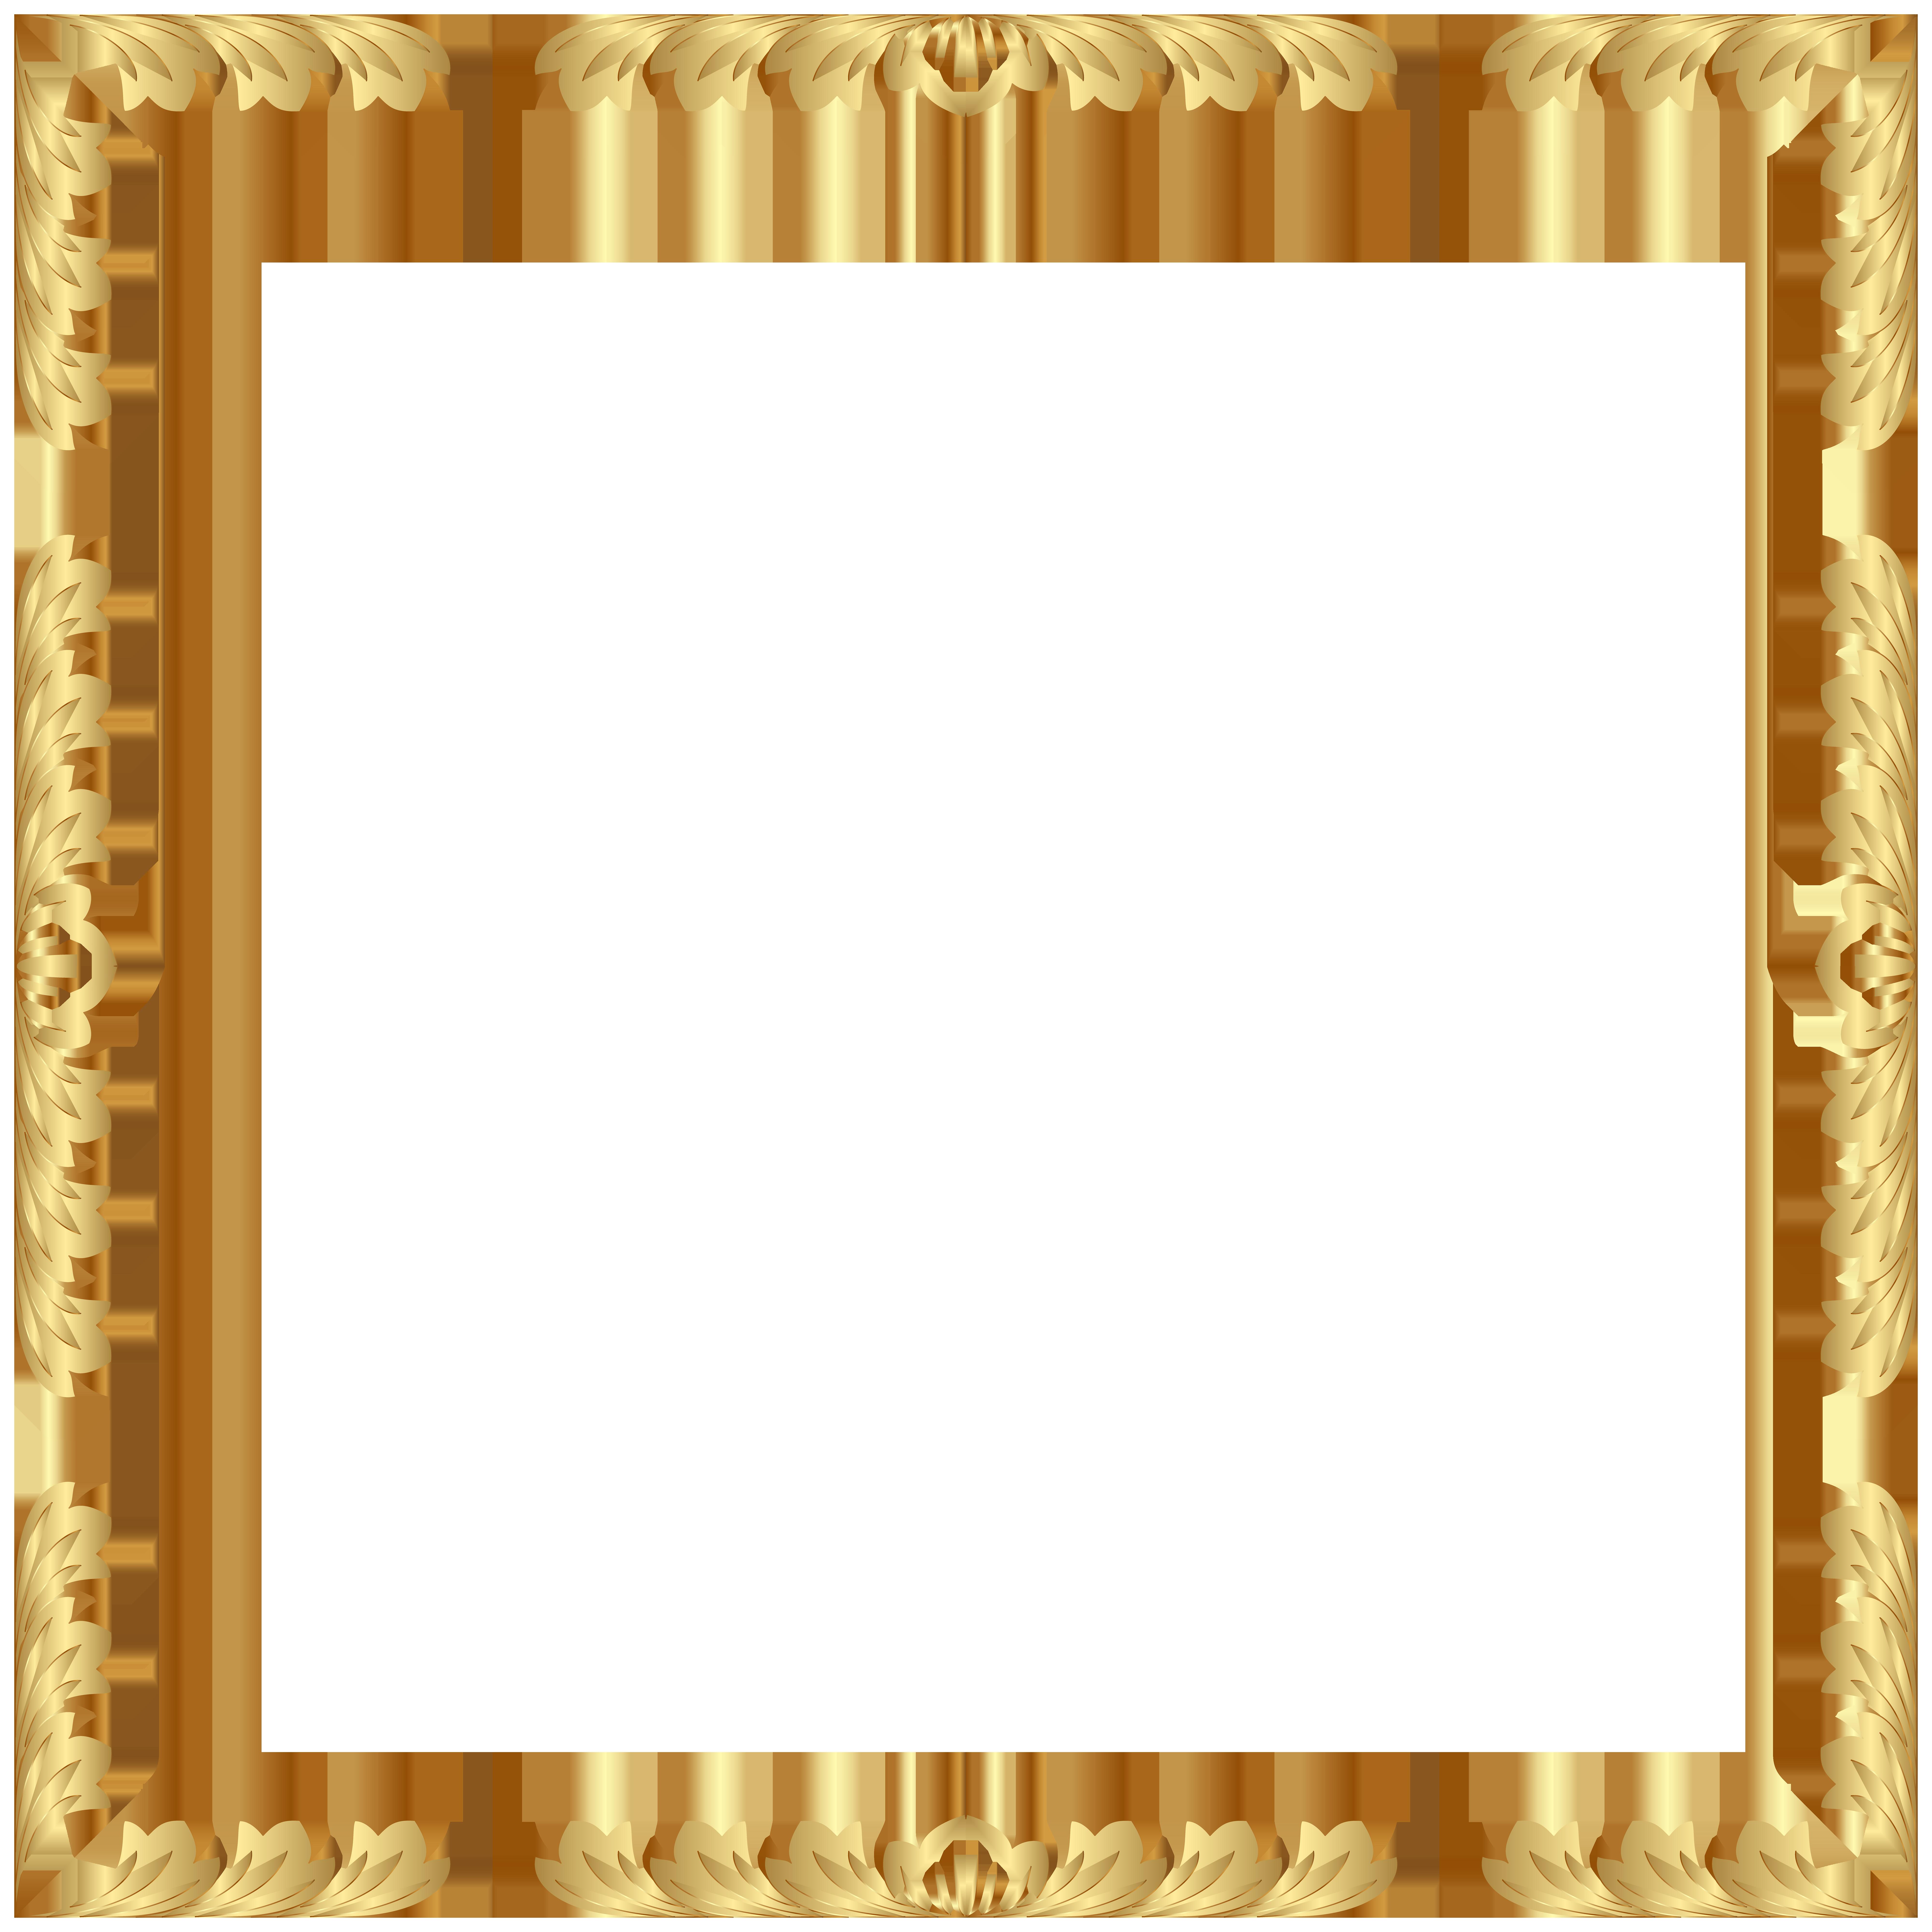 Decorative border frame transparent. Frames clipart rectangle